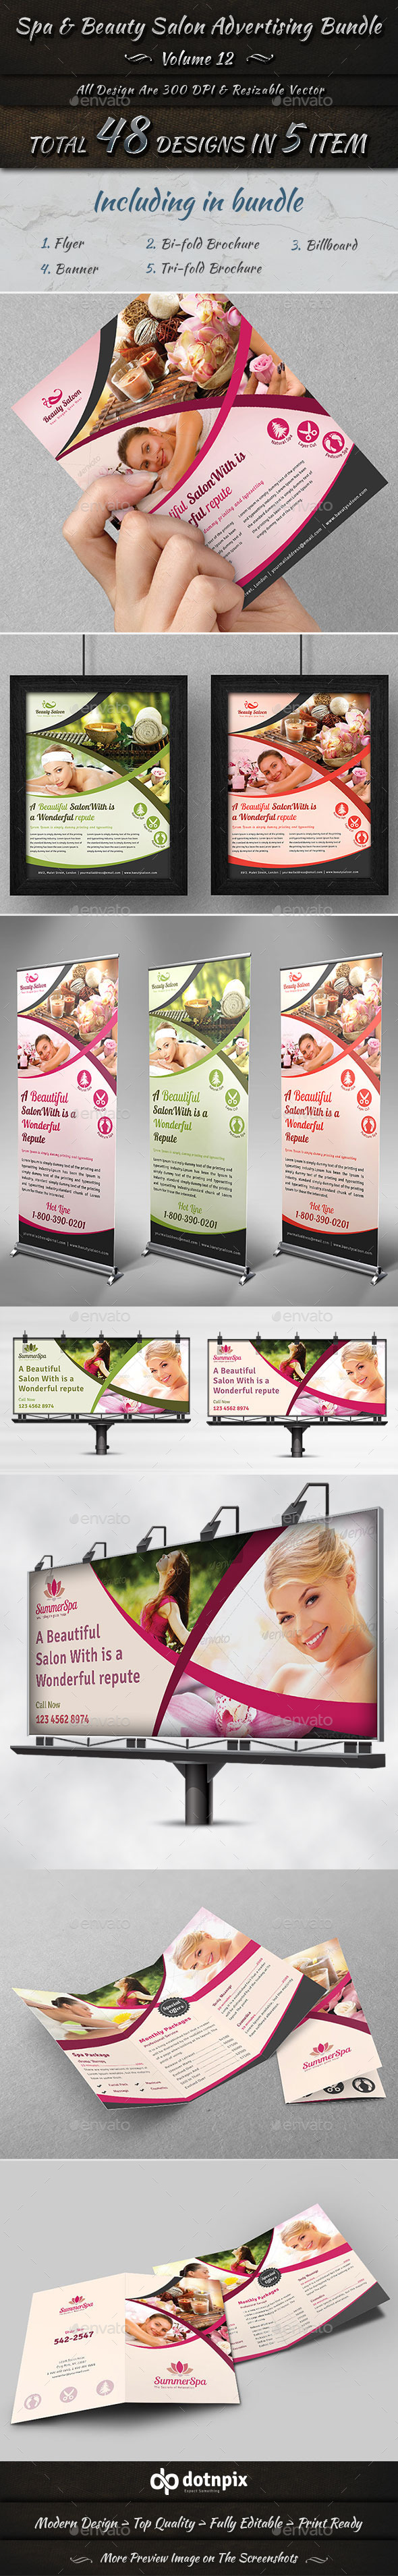 Spa & Beauty Salon Advertising Bundle Volume 12